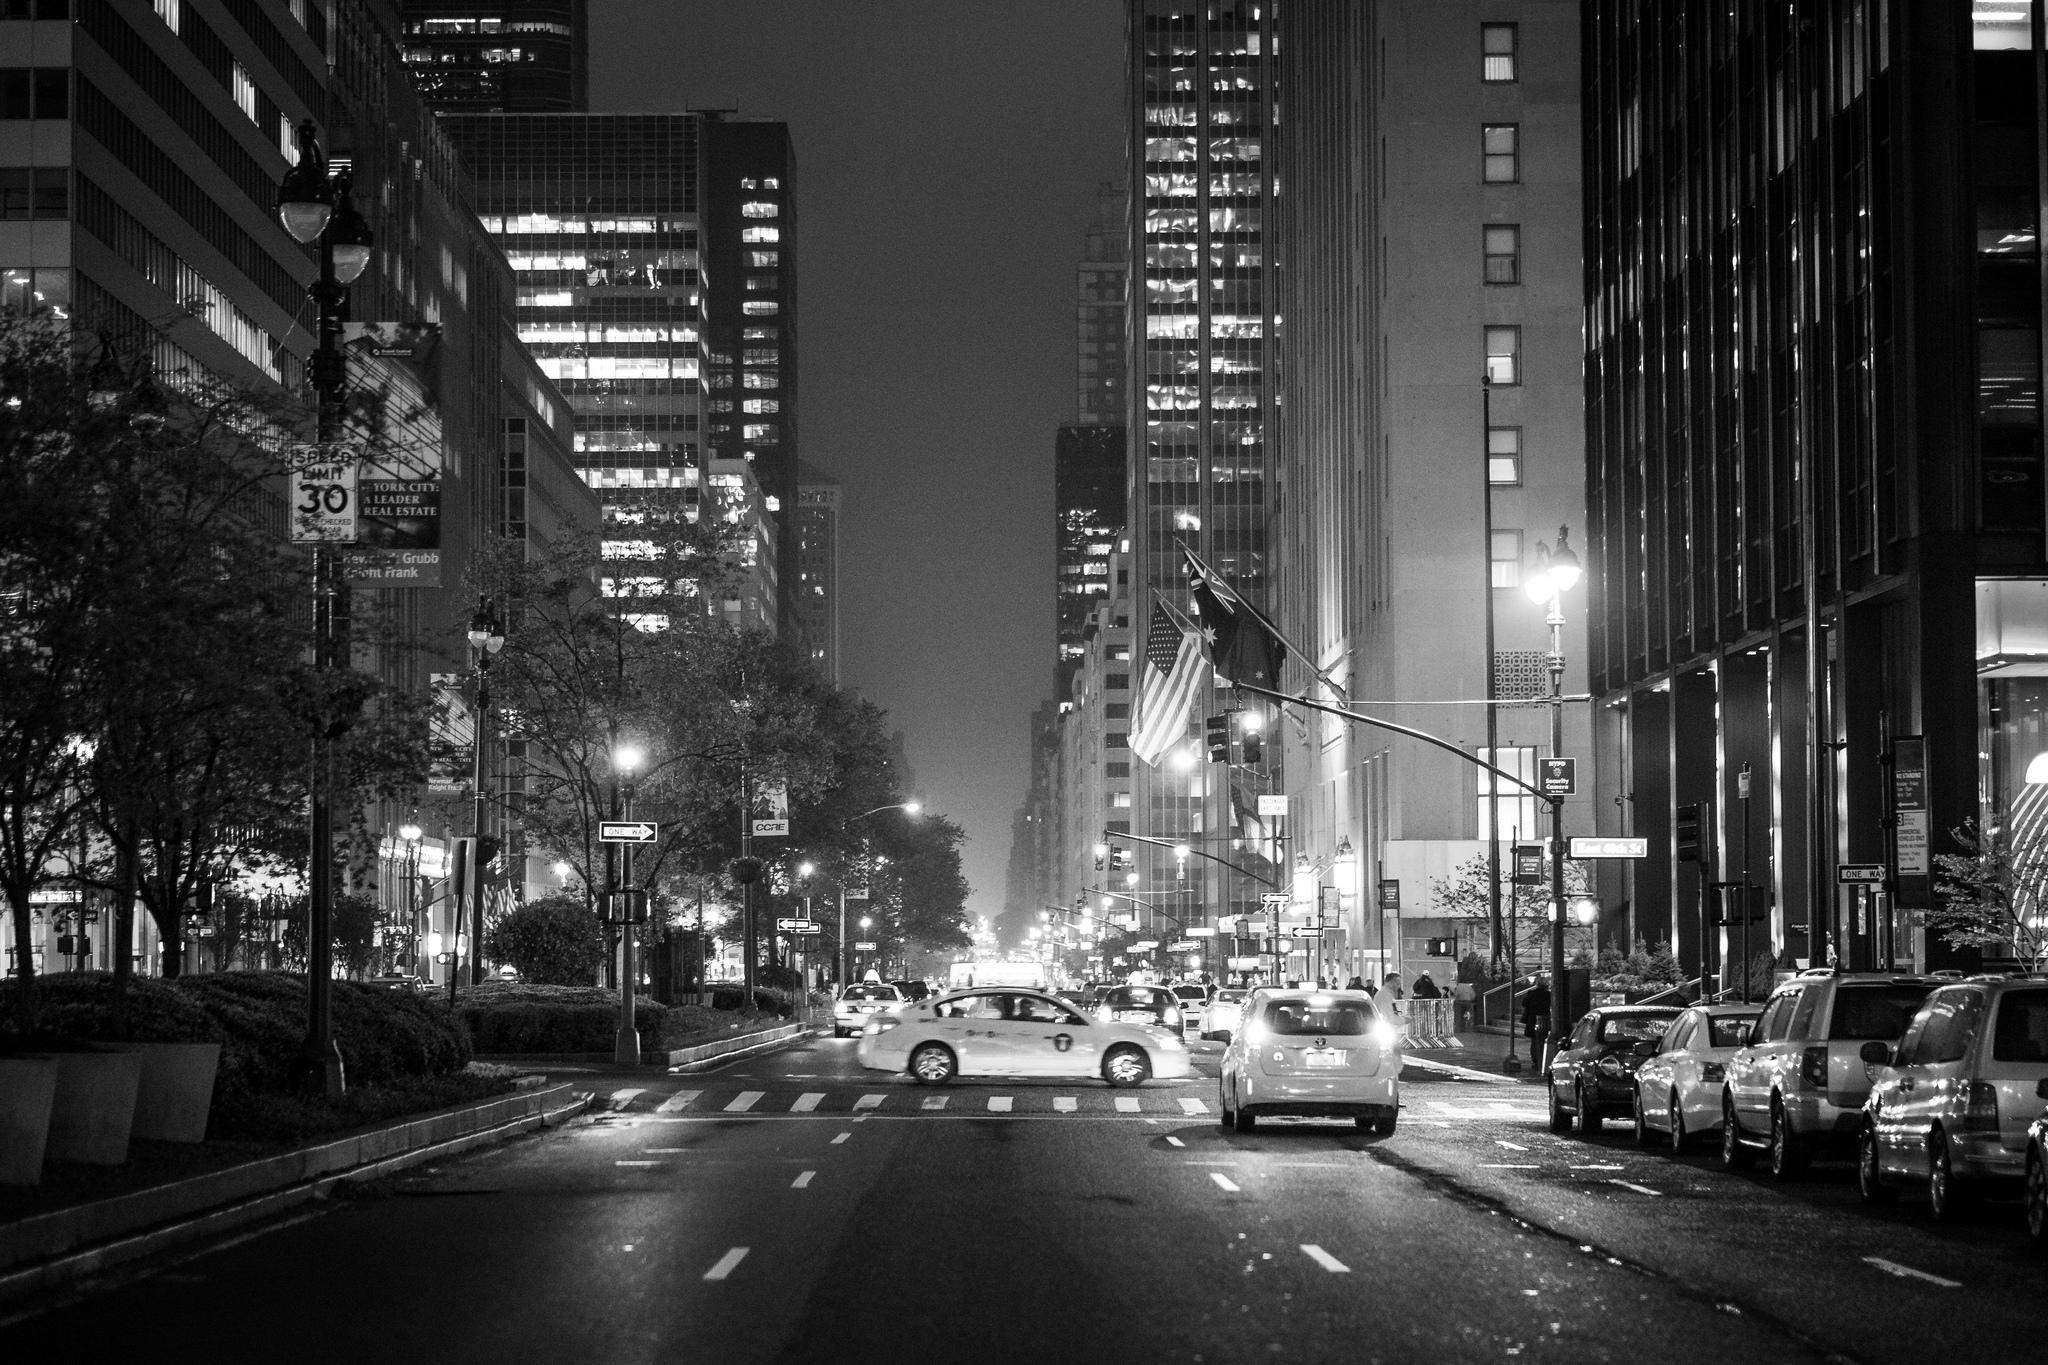 New York city streets